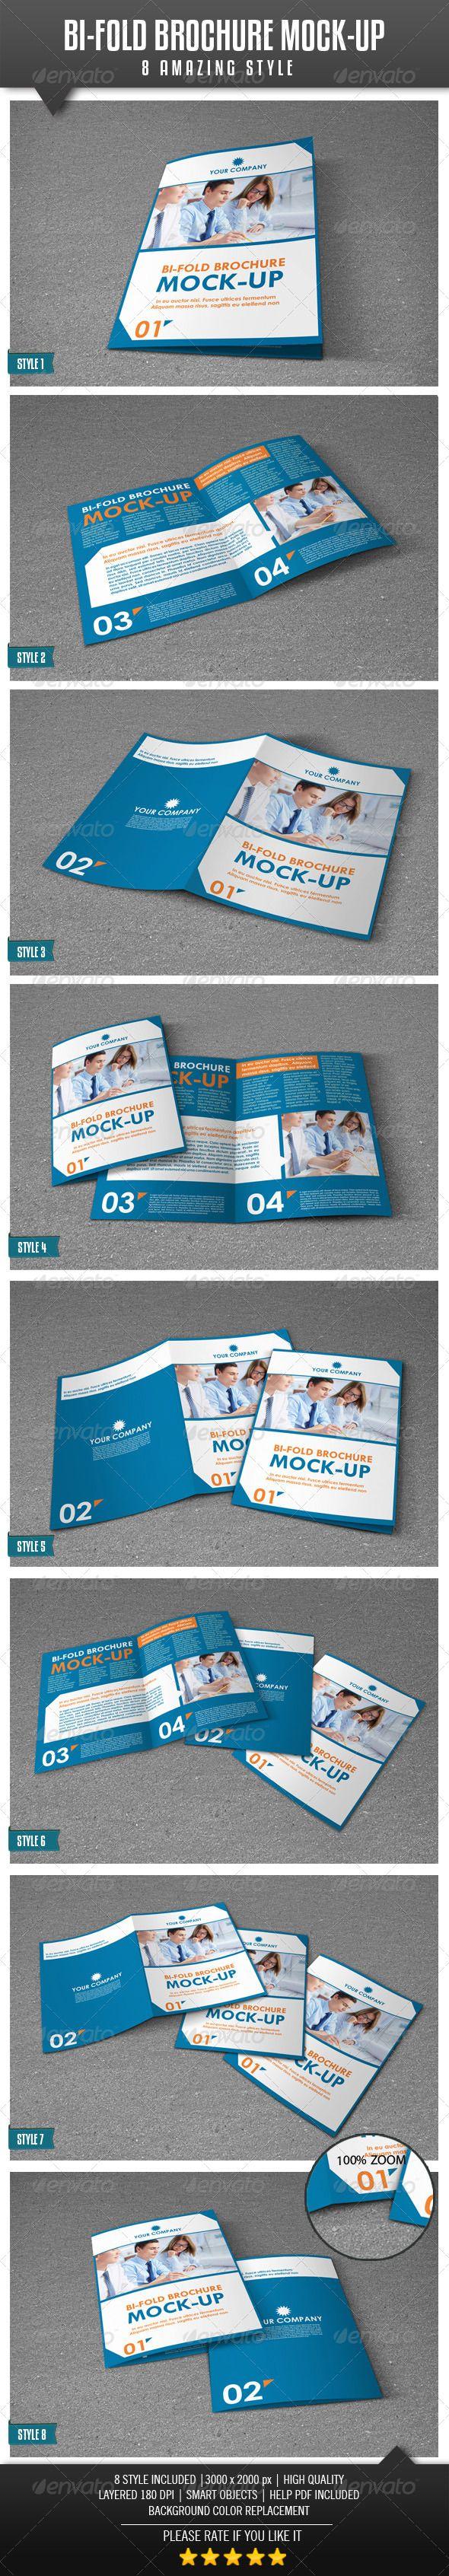 BiFold A4 Brochure Mockup – Sample Bi Fold Brochure